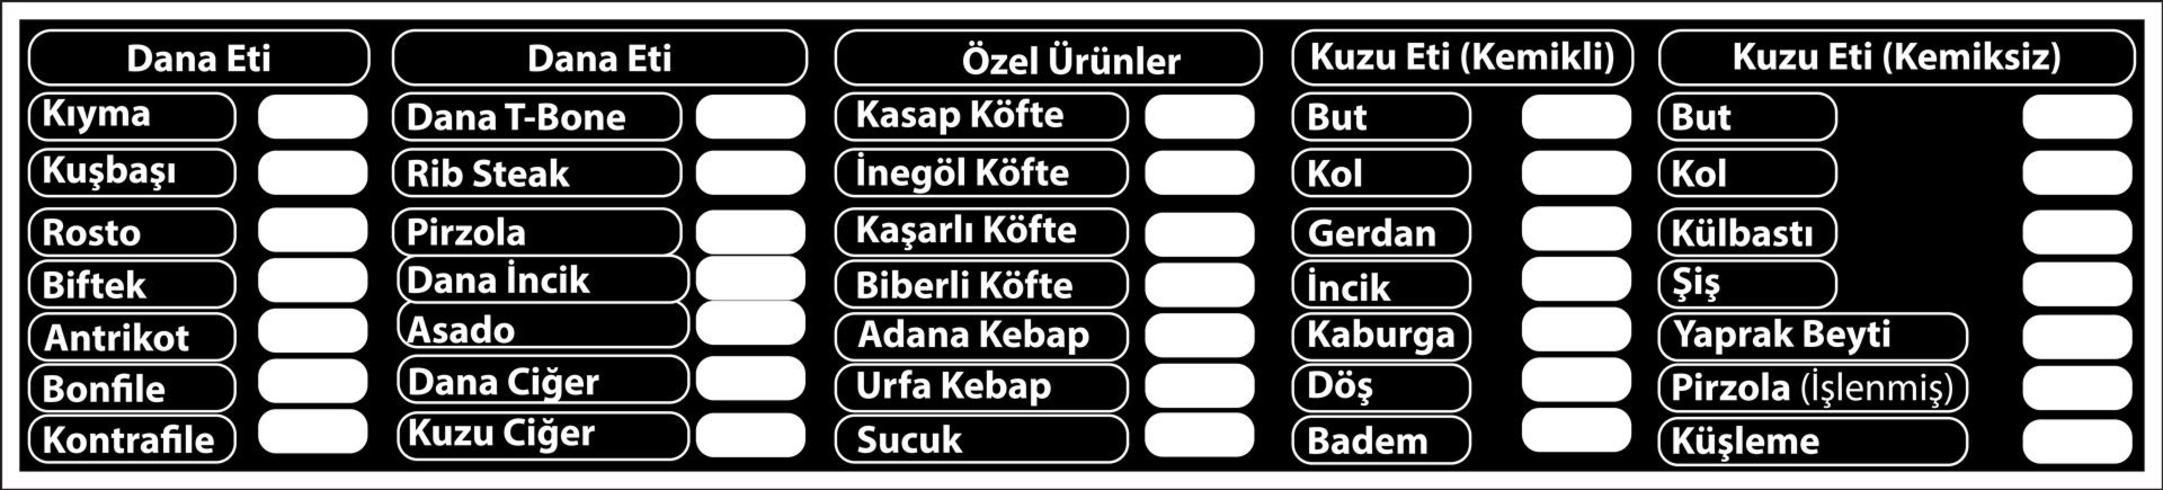 Turkiska vintage signage modeller, s r et et kas ap ap,,,, karatahta kesim s? R et,, barbekü, men, pirzola, bonfile - översättning: vintage kalkonbiff slakteri butik, svarta tavlor av nötkött, grill, ben, revben, biff.